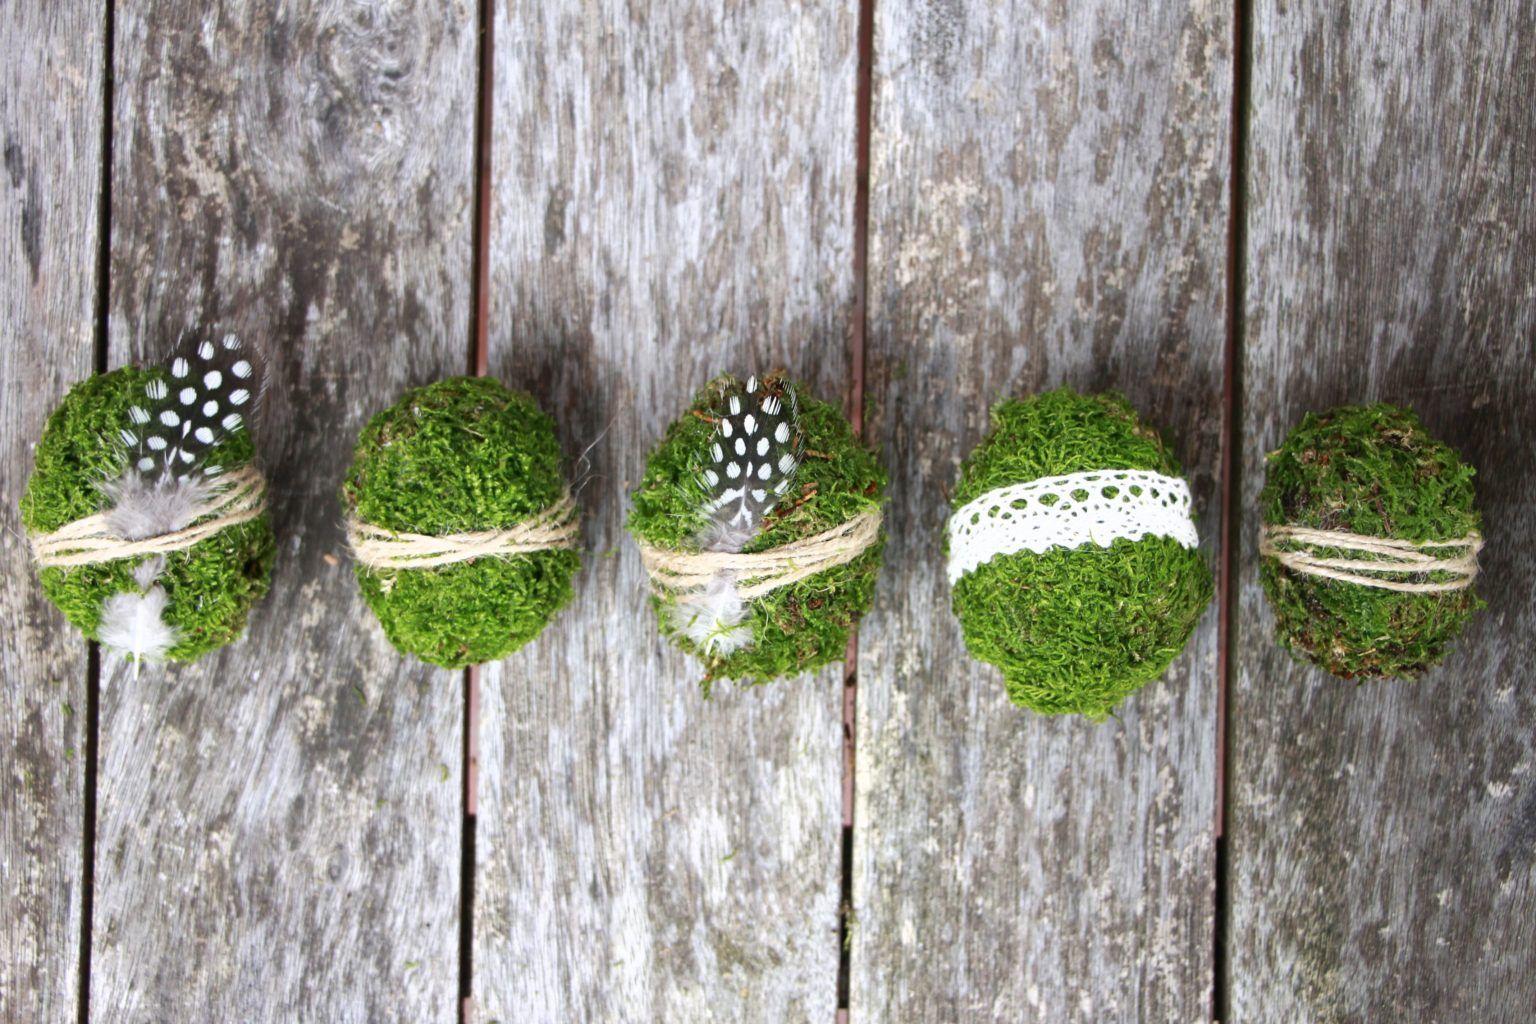 Osterdeko basteln: DIY für Moos-Ostereier - Lavendelblog